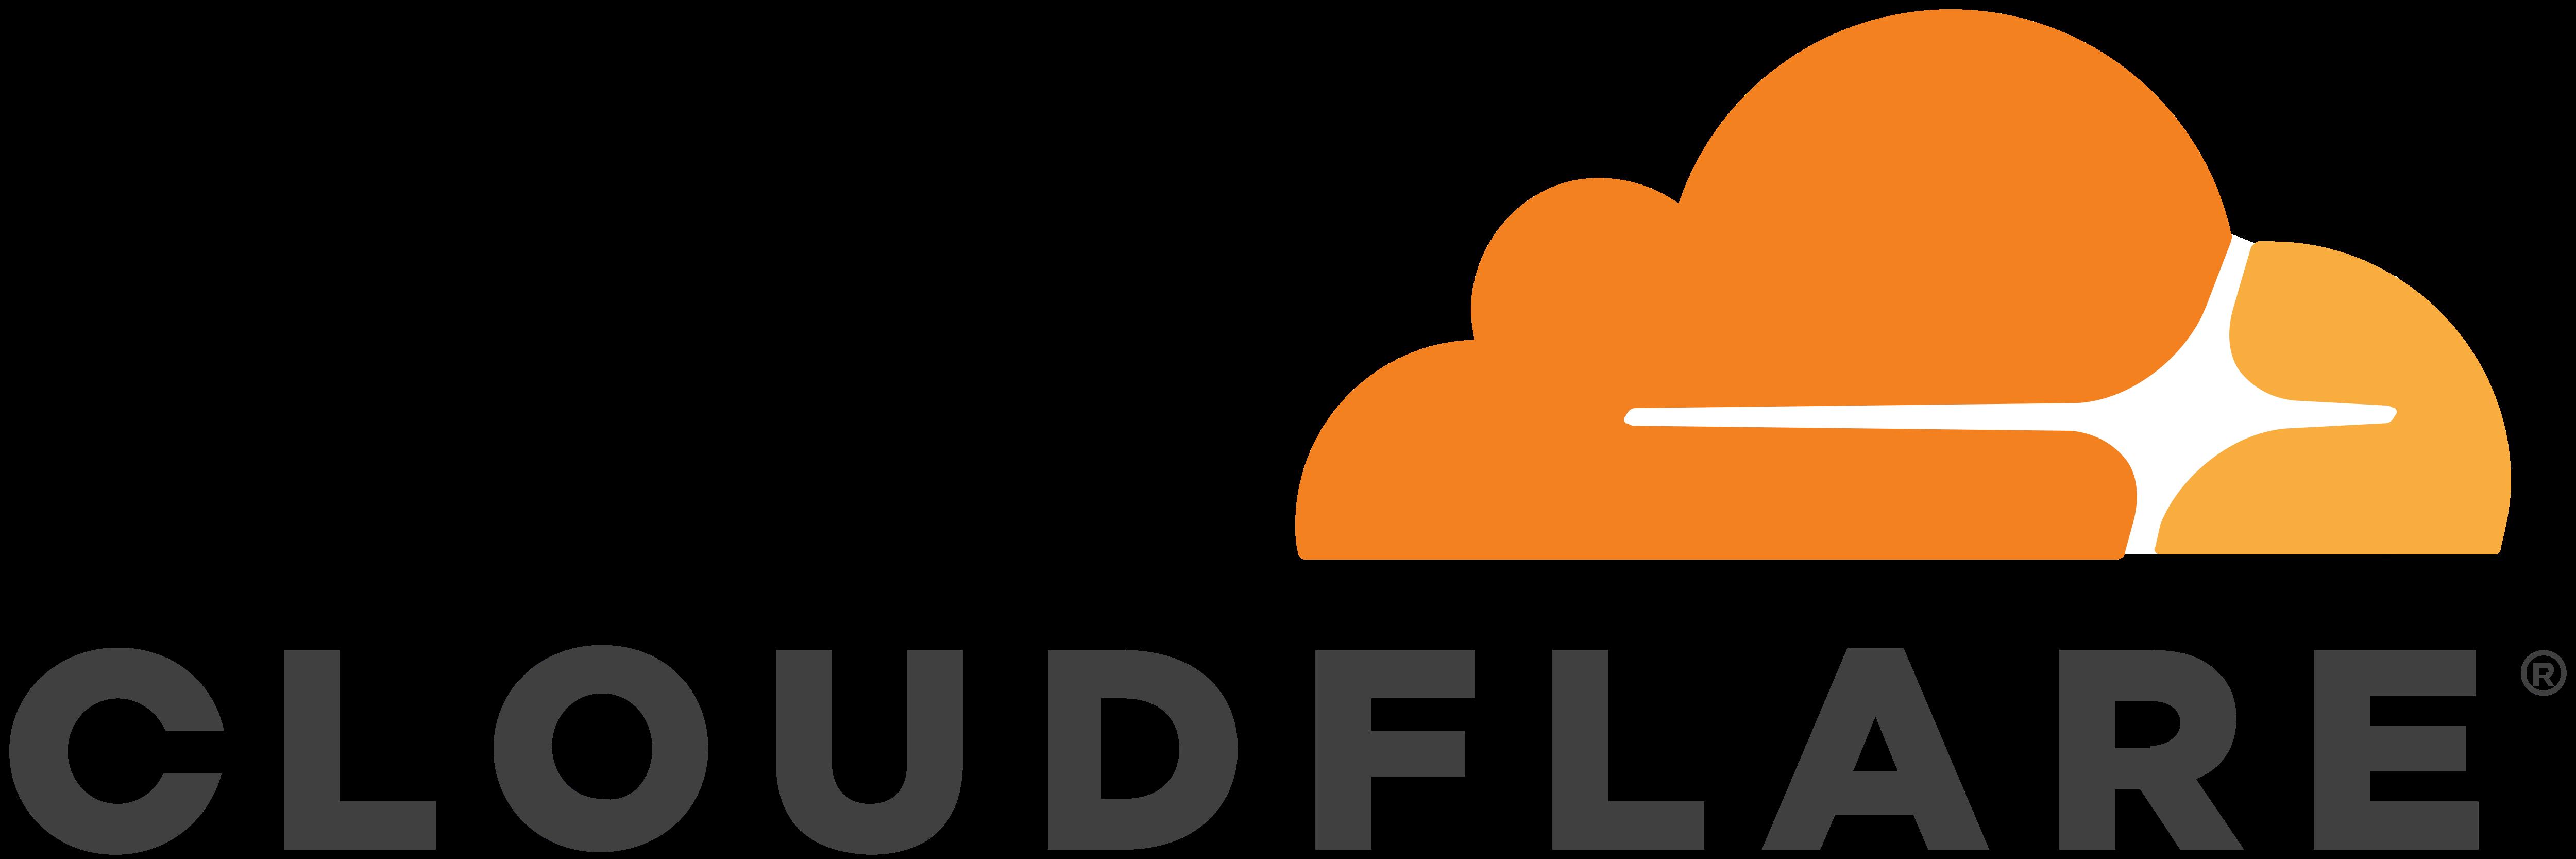 Cloudflare logo - Cloudflare Logo